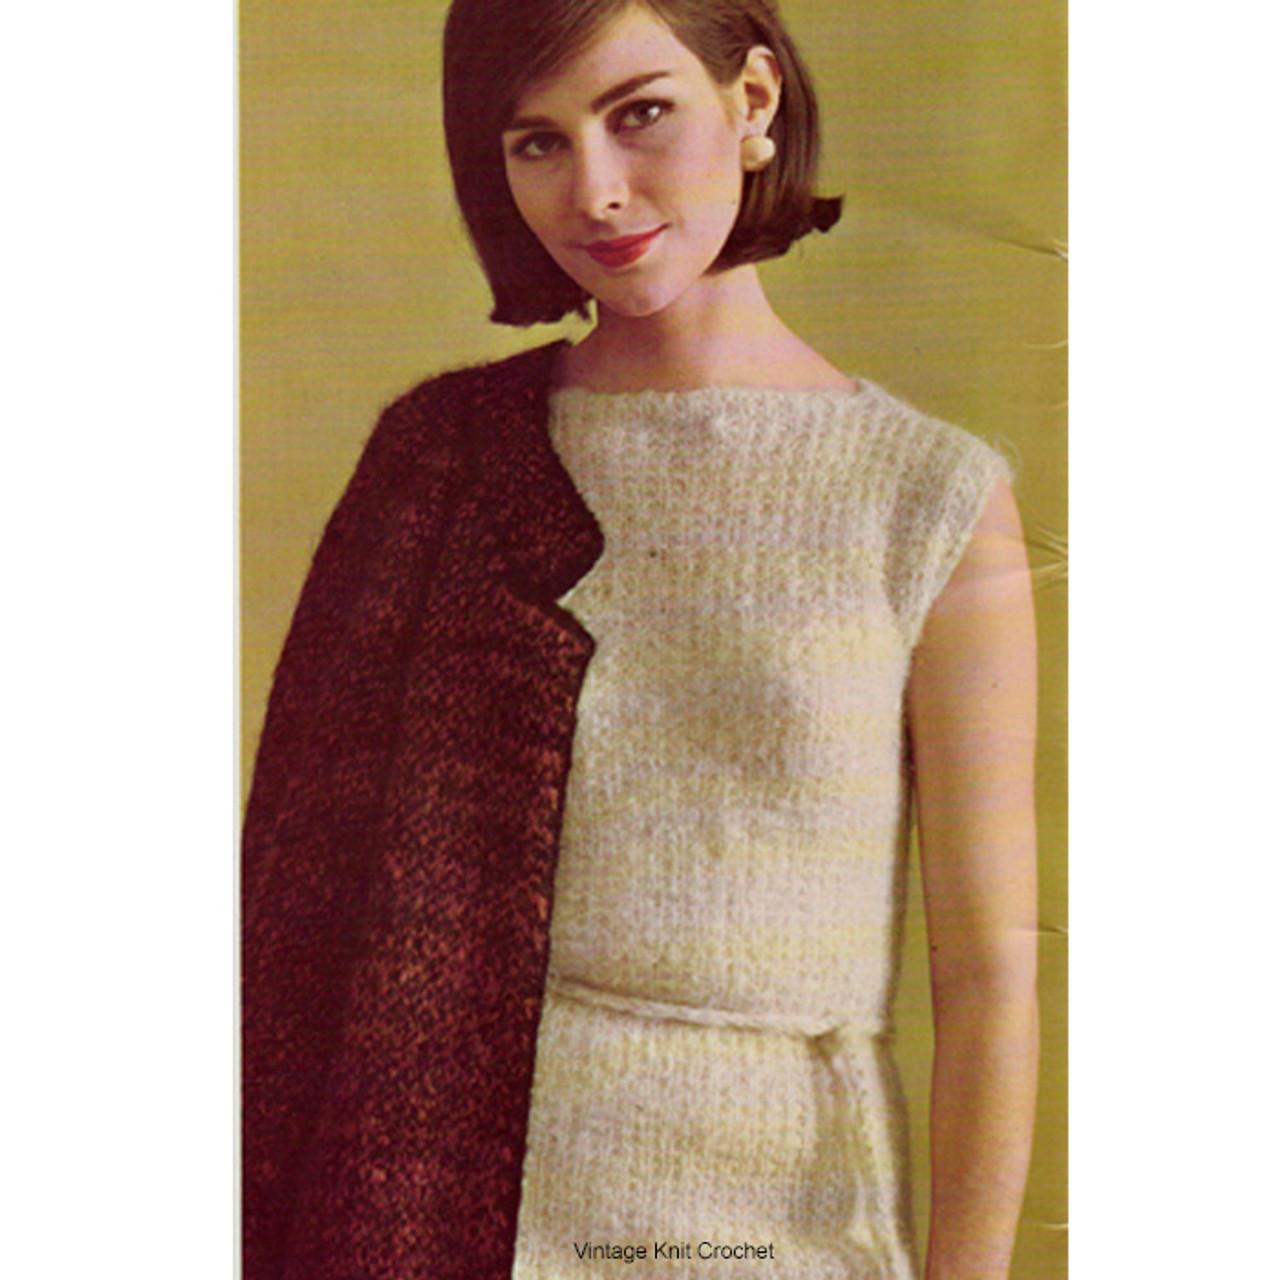 Sleeveless Knitted Dress in Bernat Mohairspun Yarn